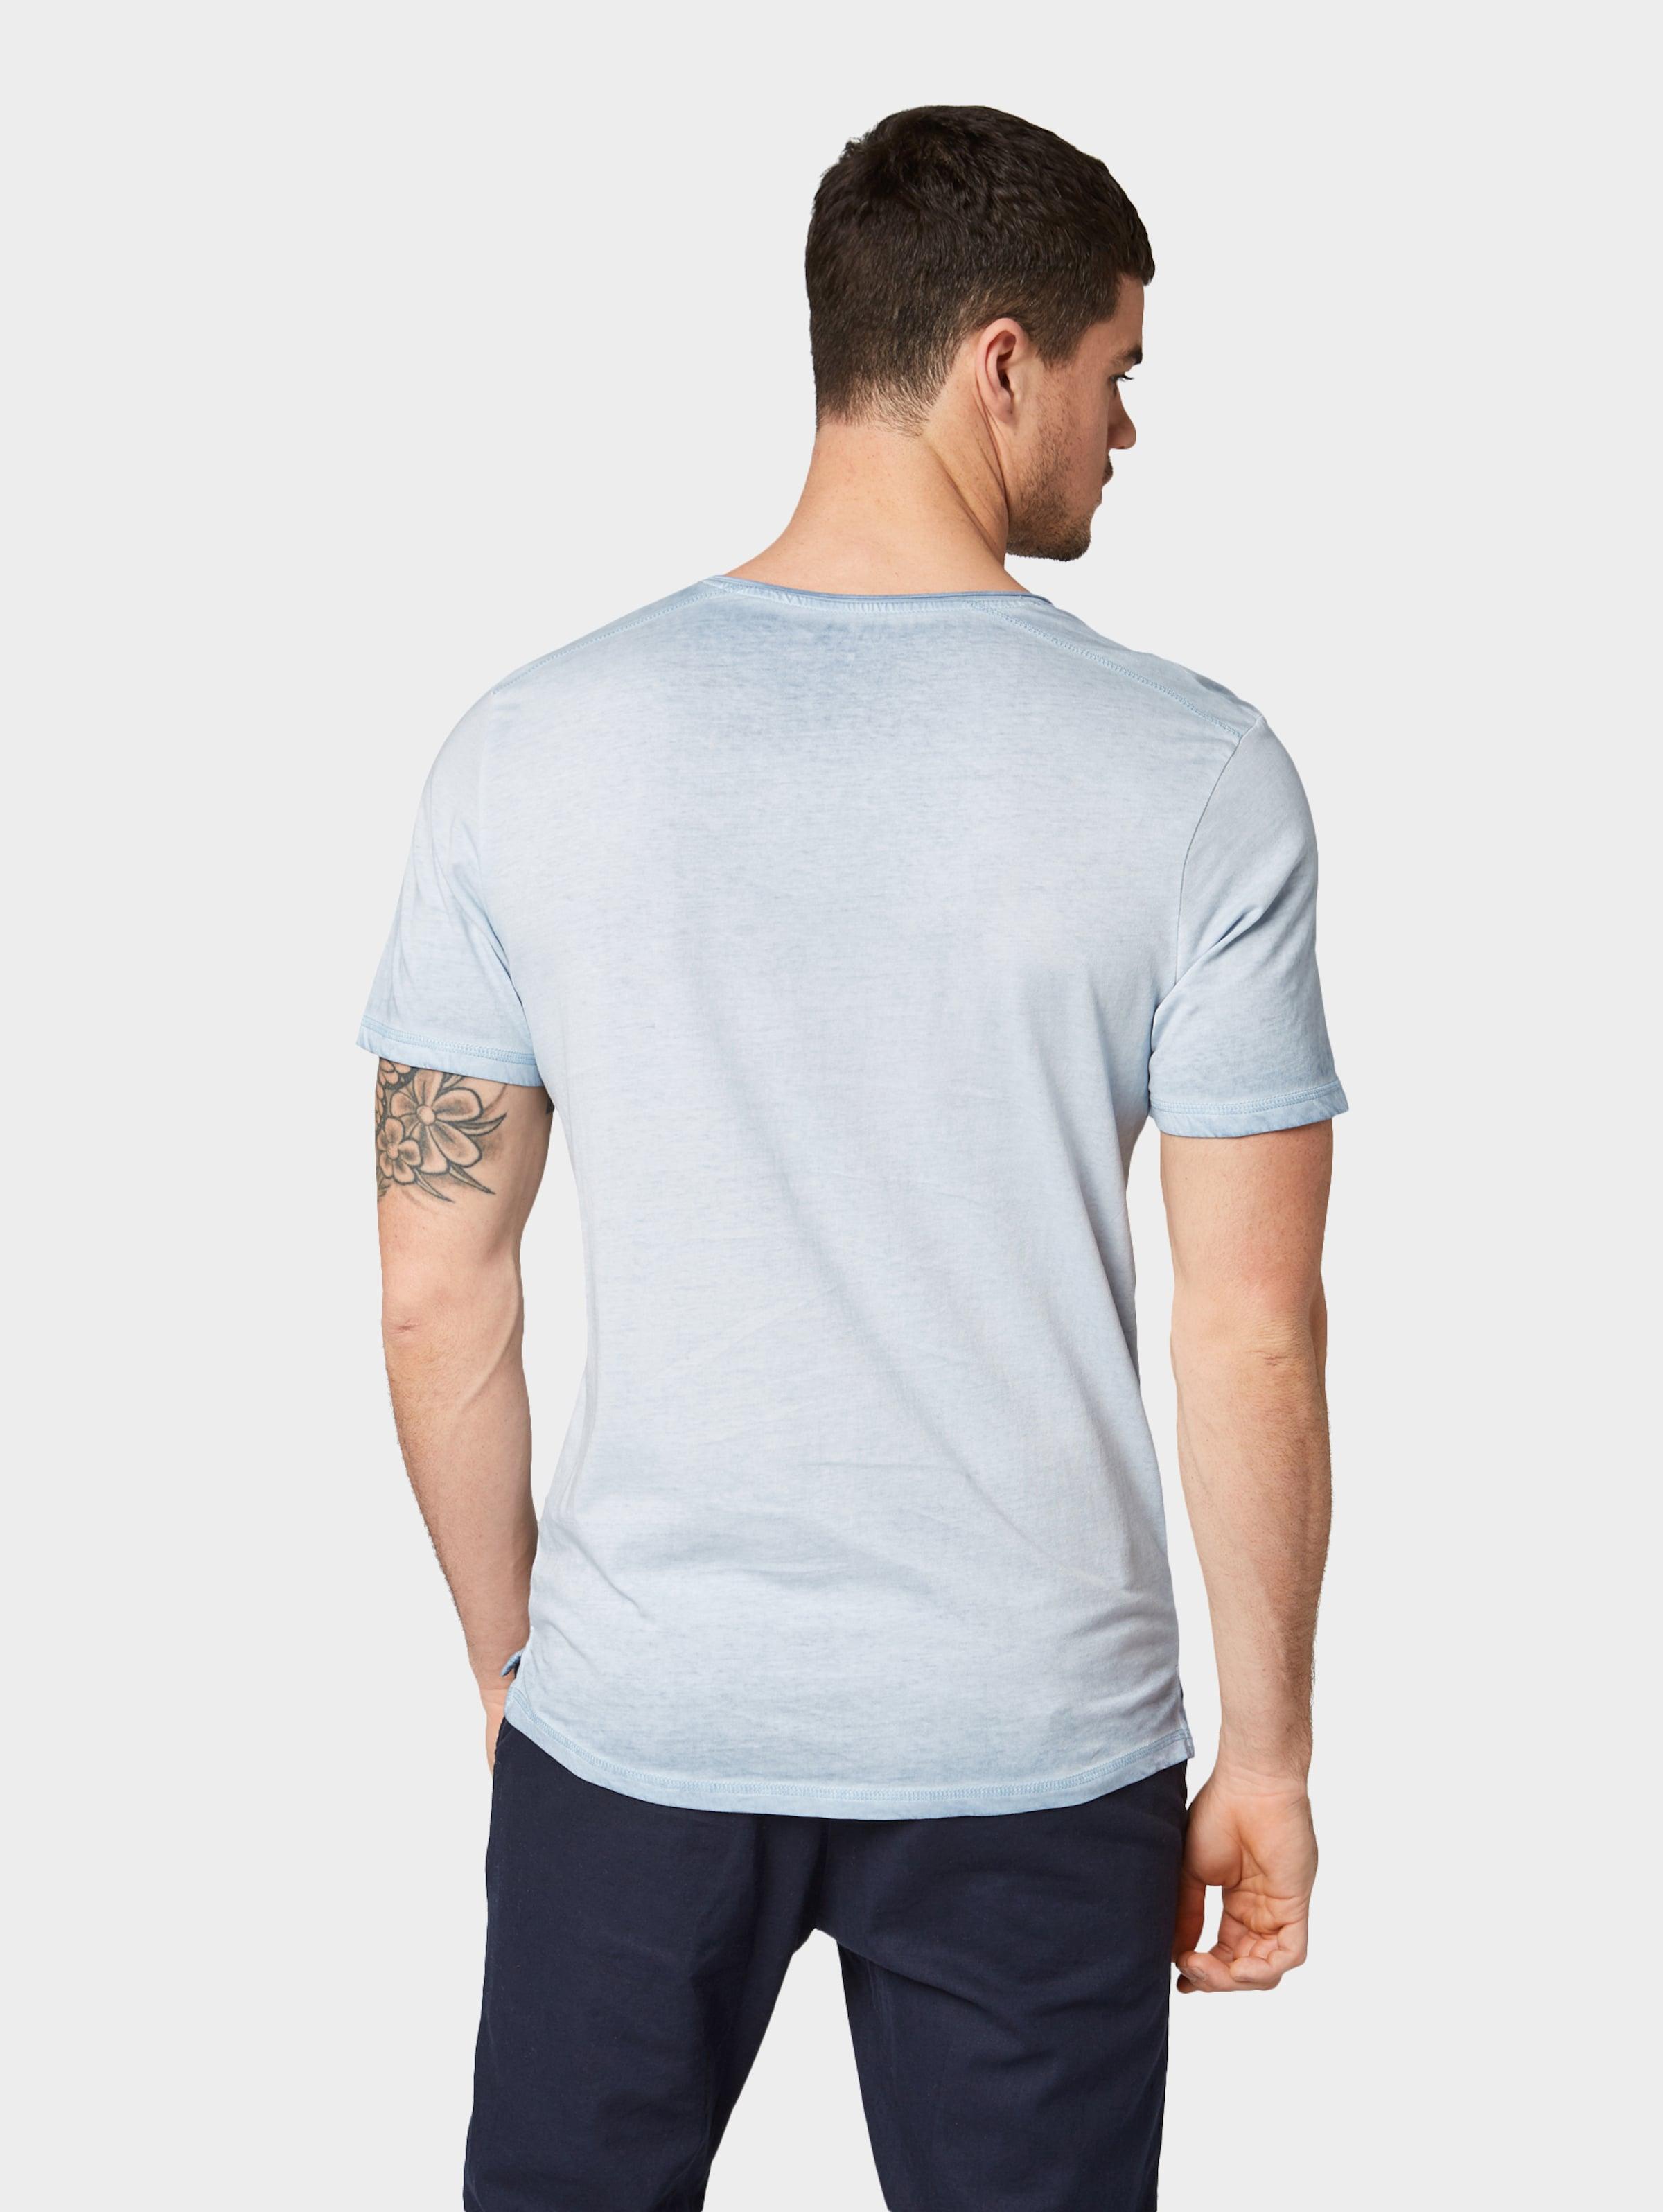 T shirt In Tailor NachtblauHellblau Tom hxrtQBCosd